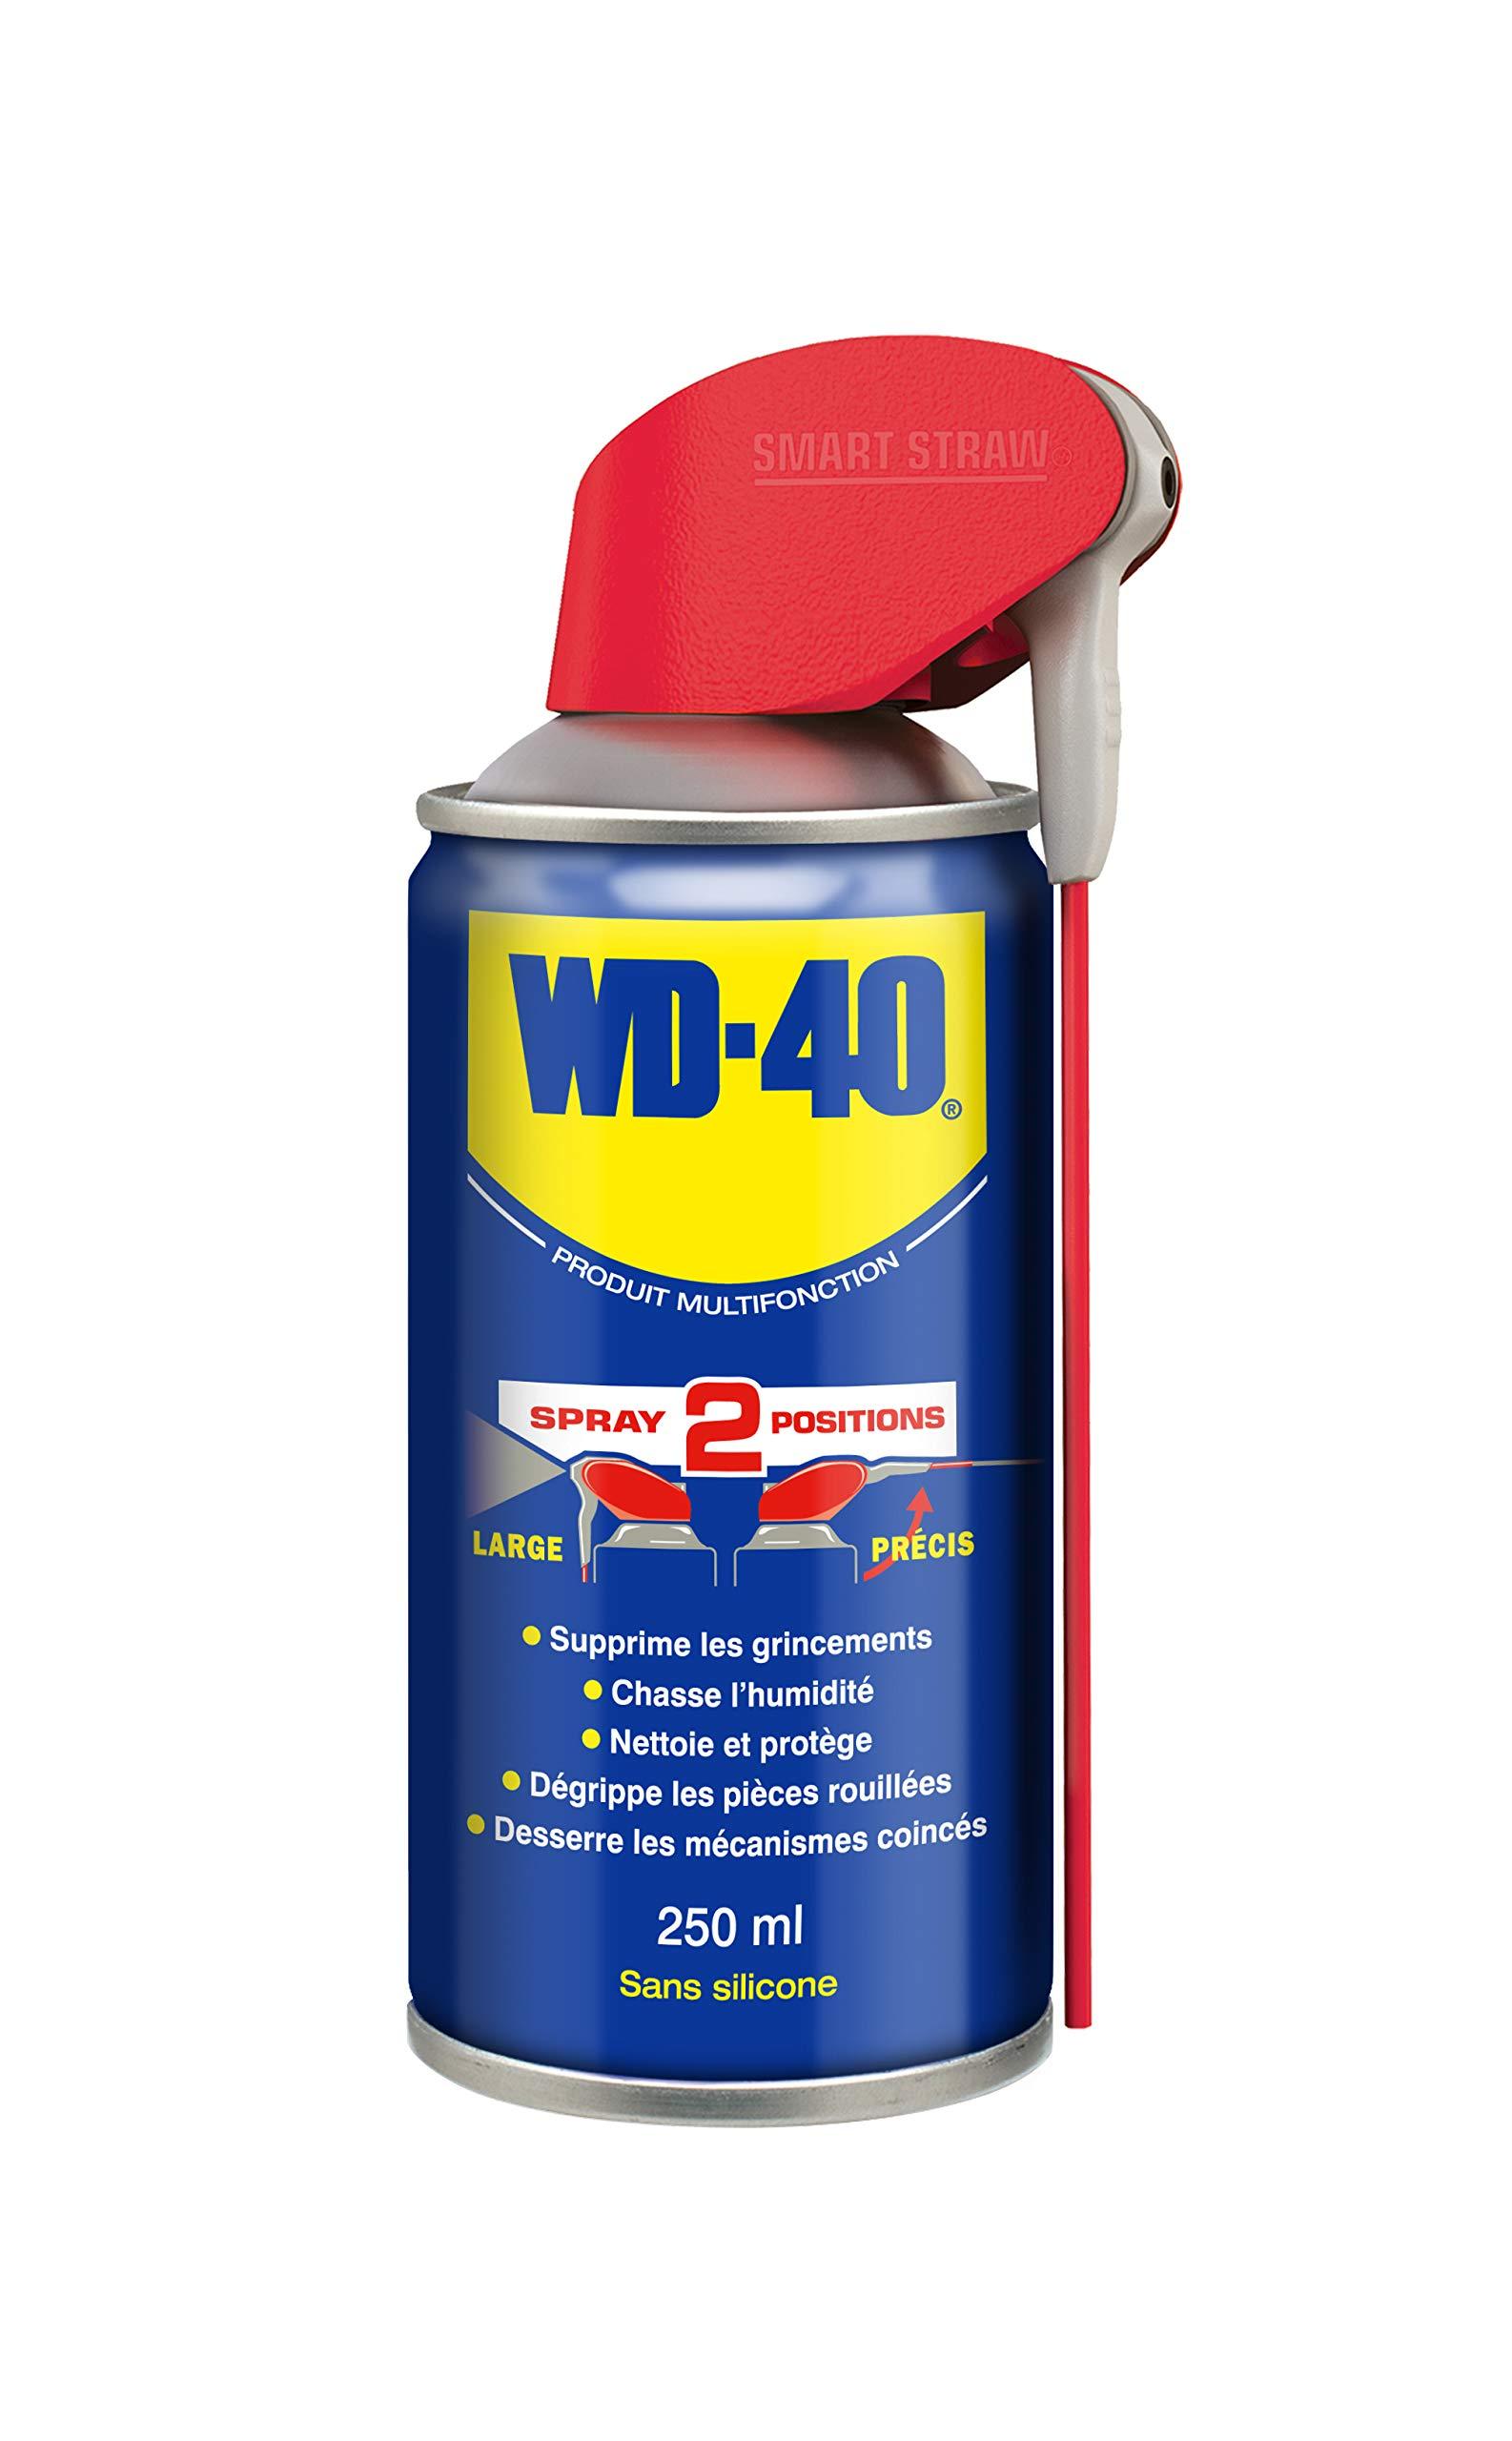 WD-40 aérosol double position 250ml product image